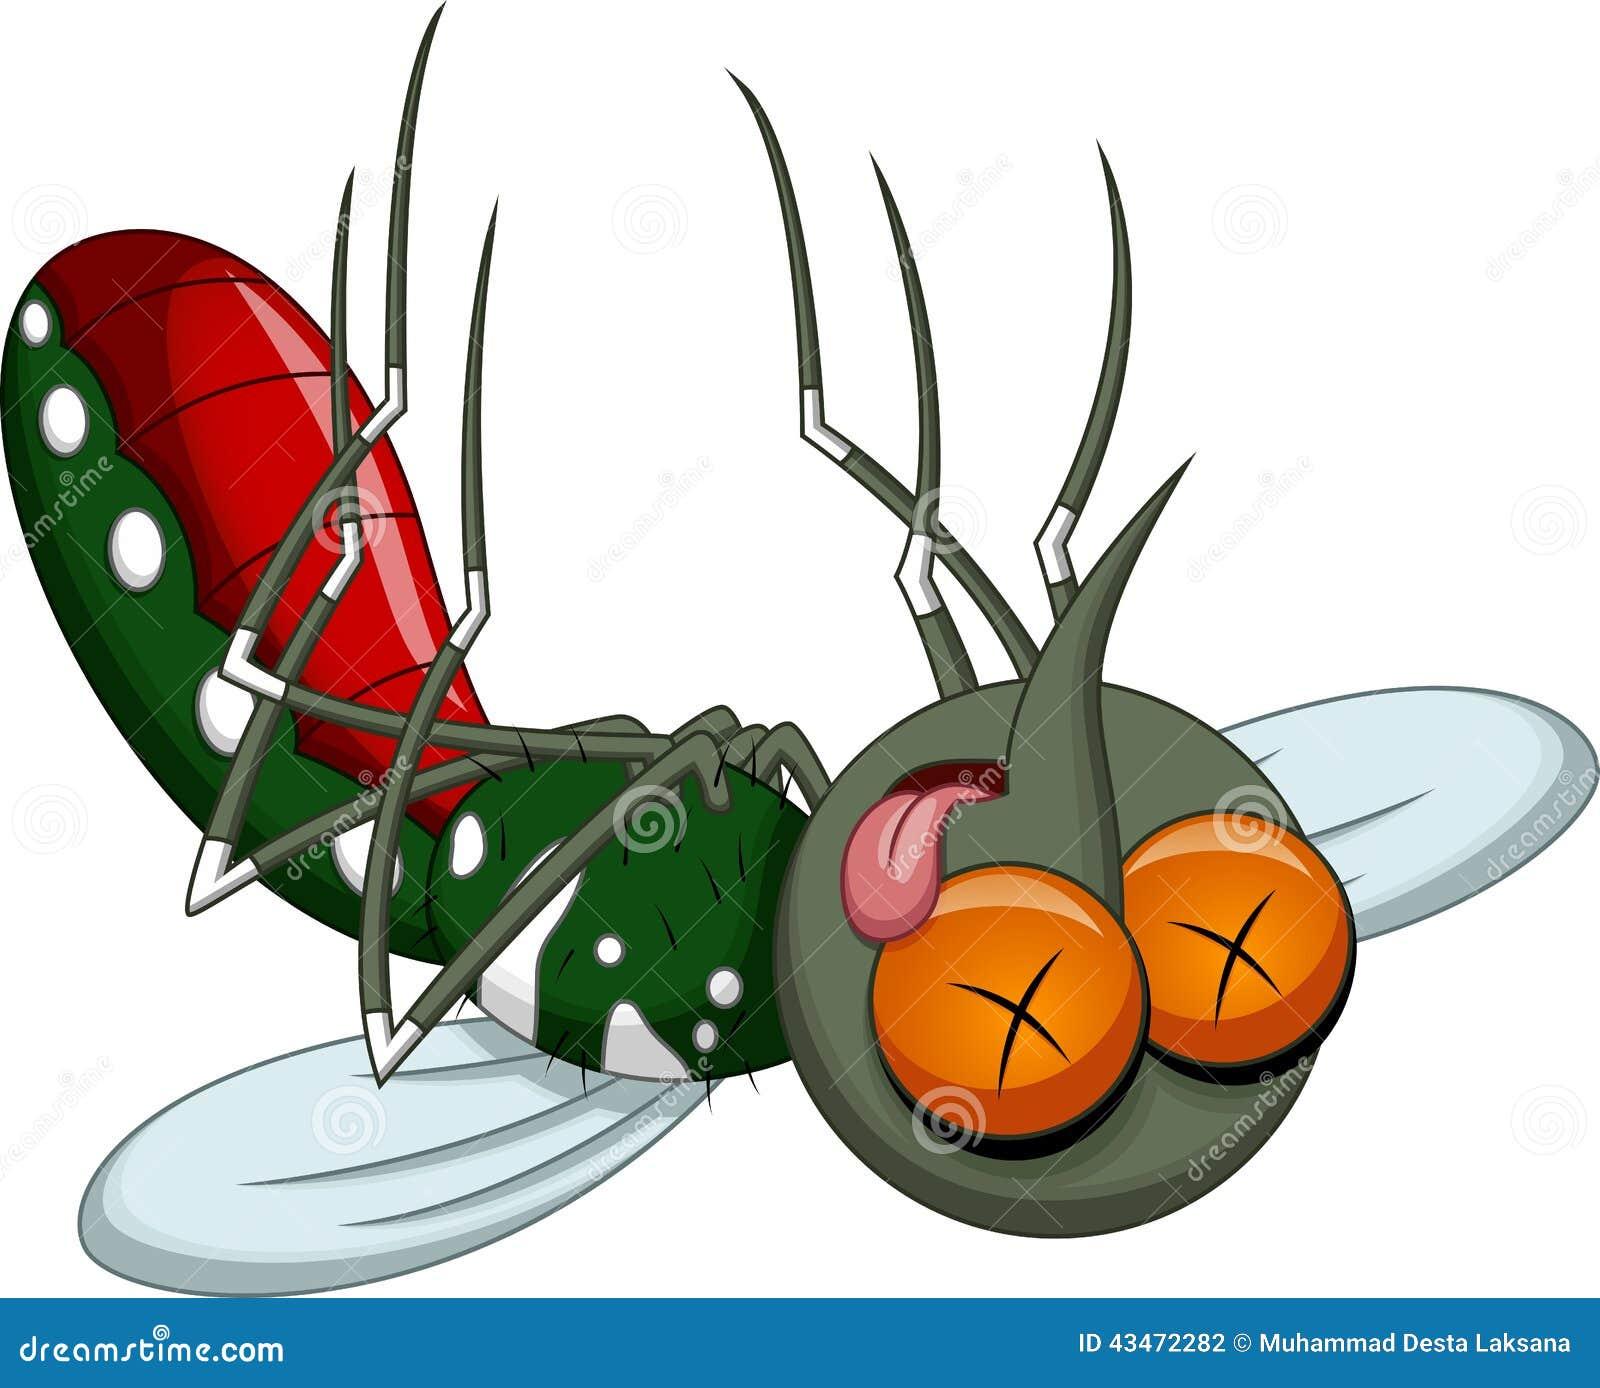 Death Mosquito Cartoon Stock Illustration - Image: 43472282